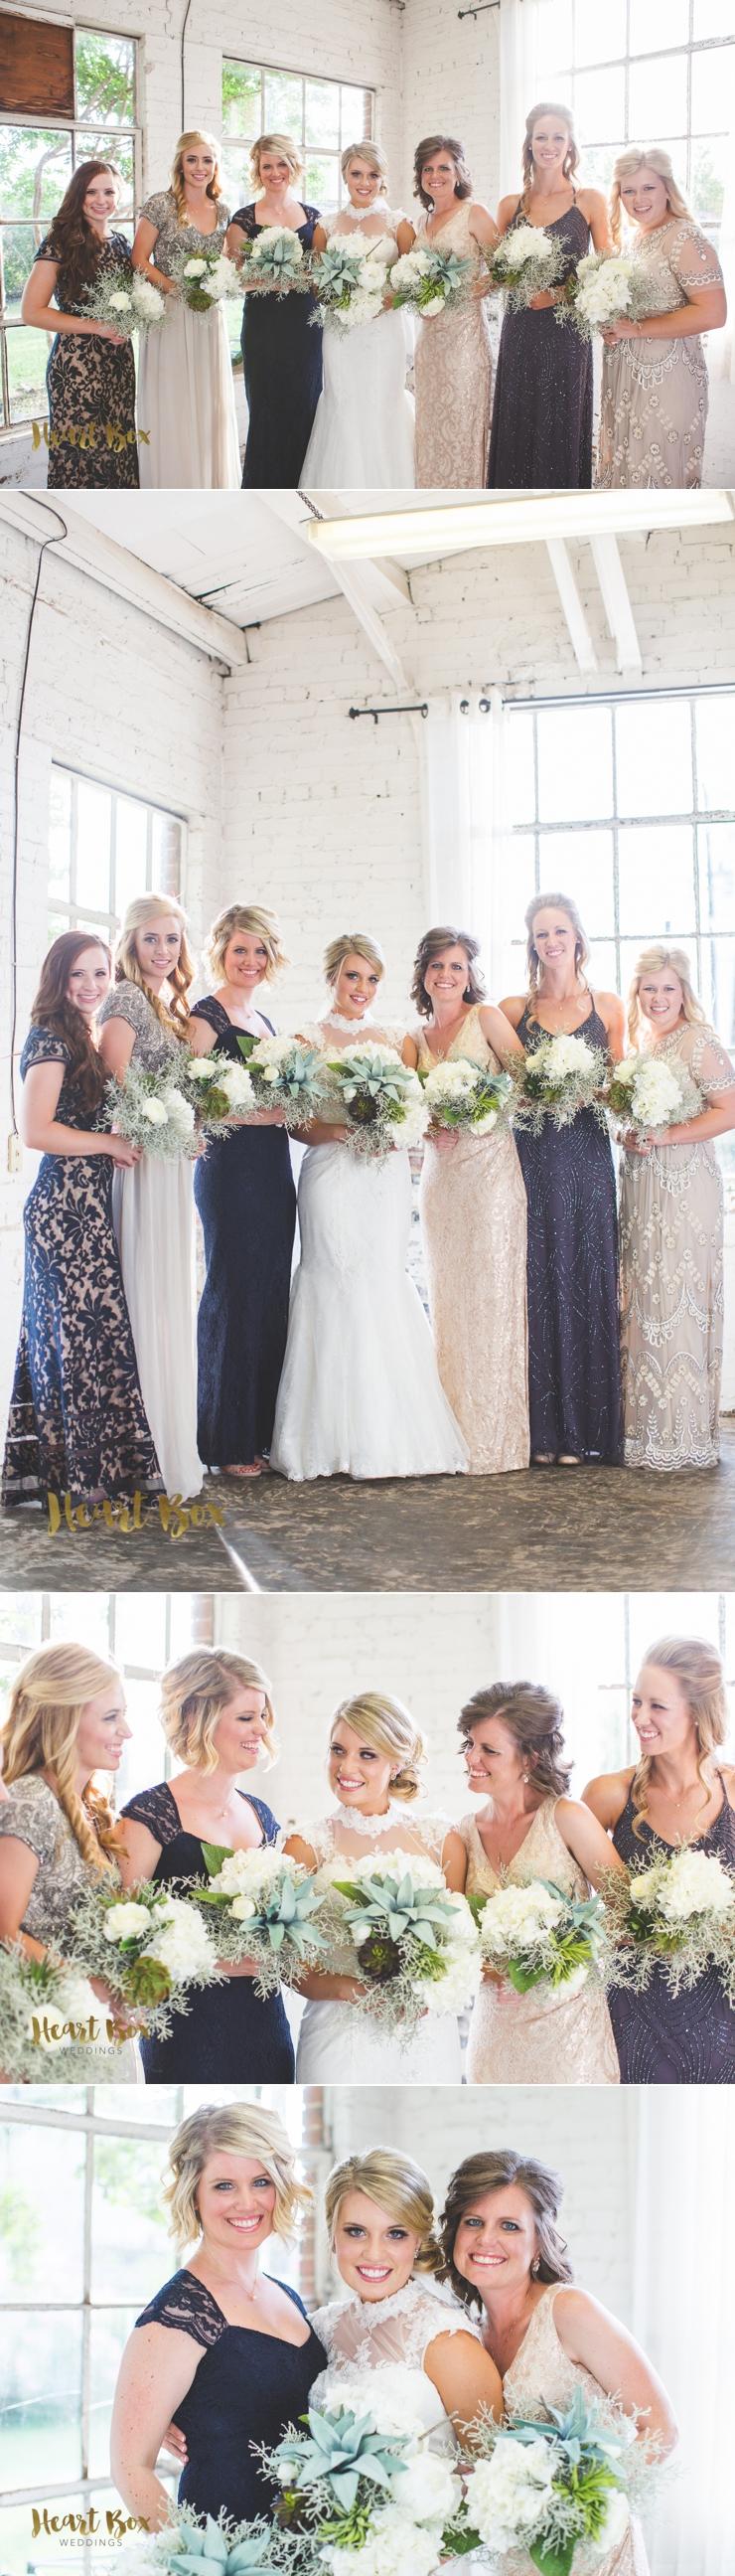 Mabry Wedding 13.jpg